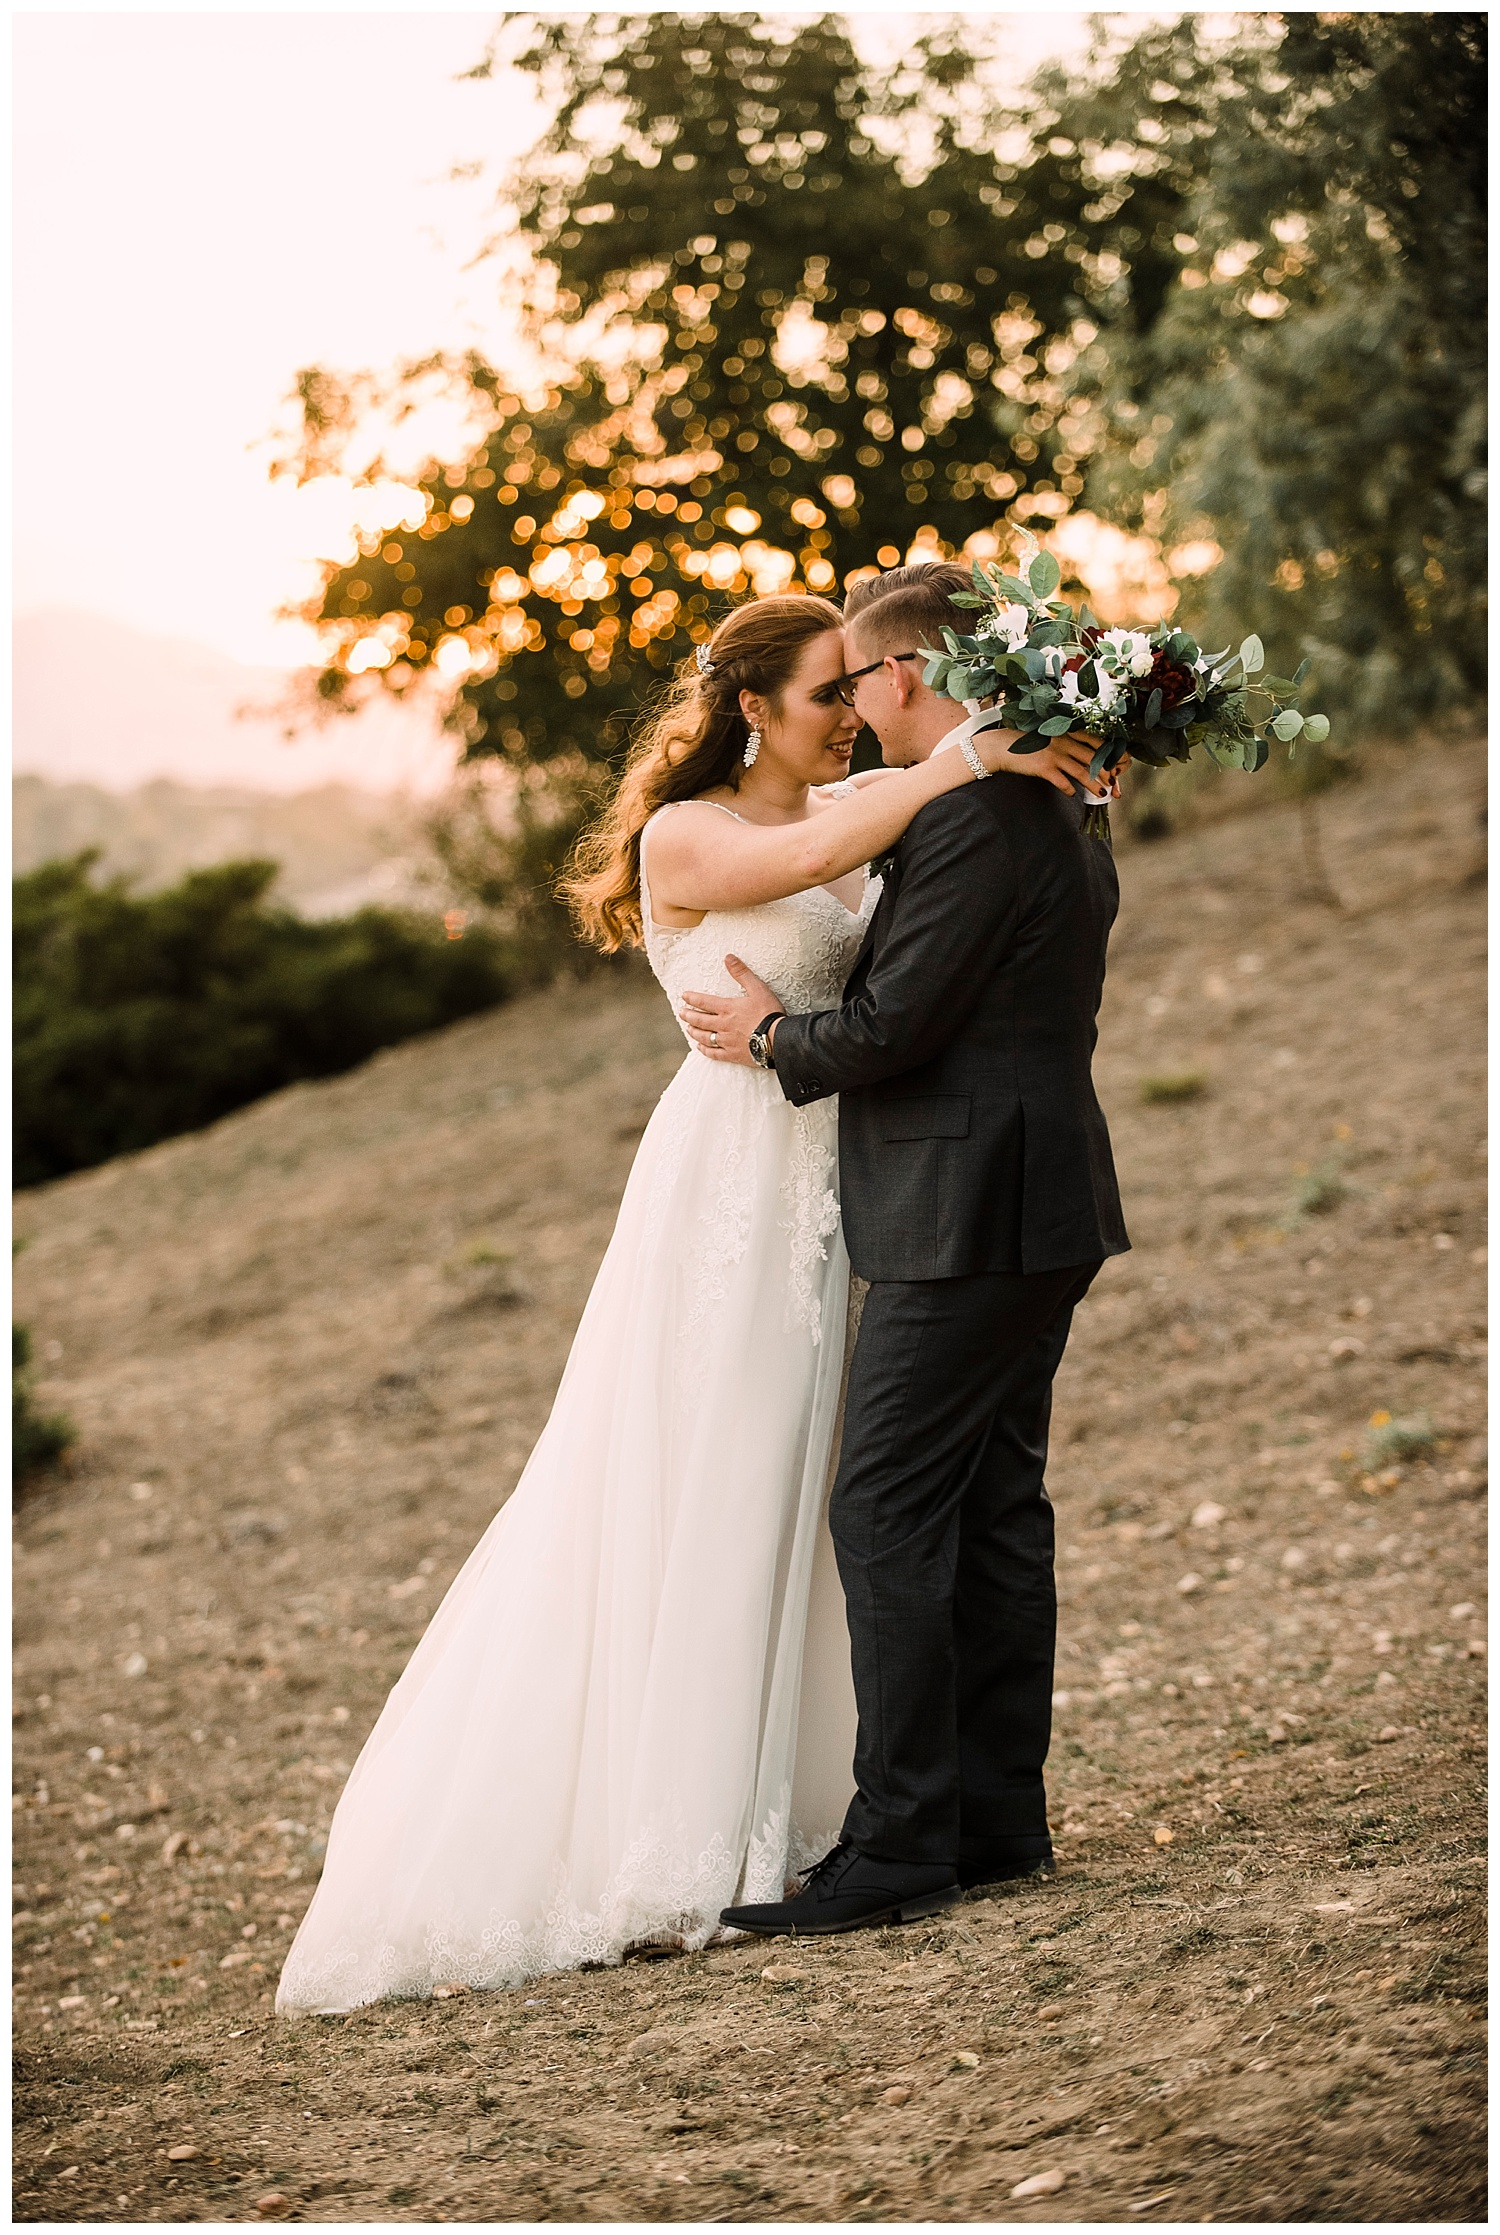 Danish_Wedding_Traditions_Denver_Colorado_Photographer_Wedgewood_Brittany_Hill_Apollo_Fields_024.jpg